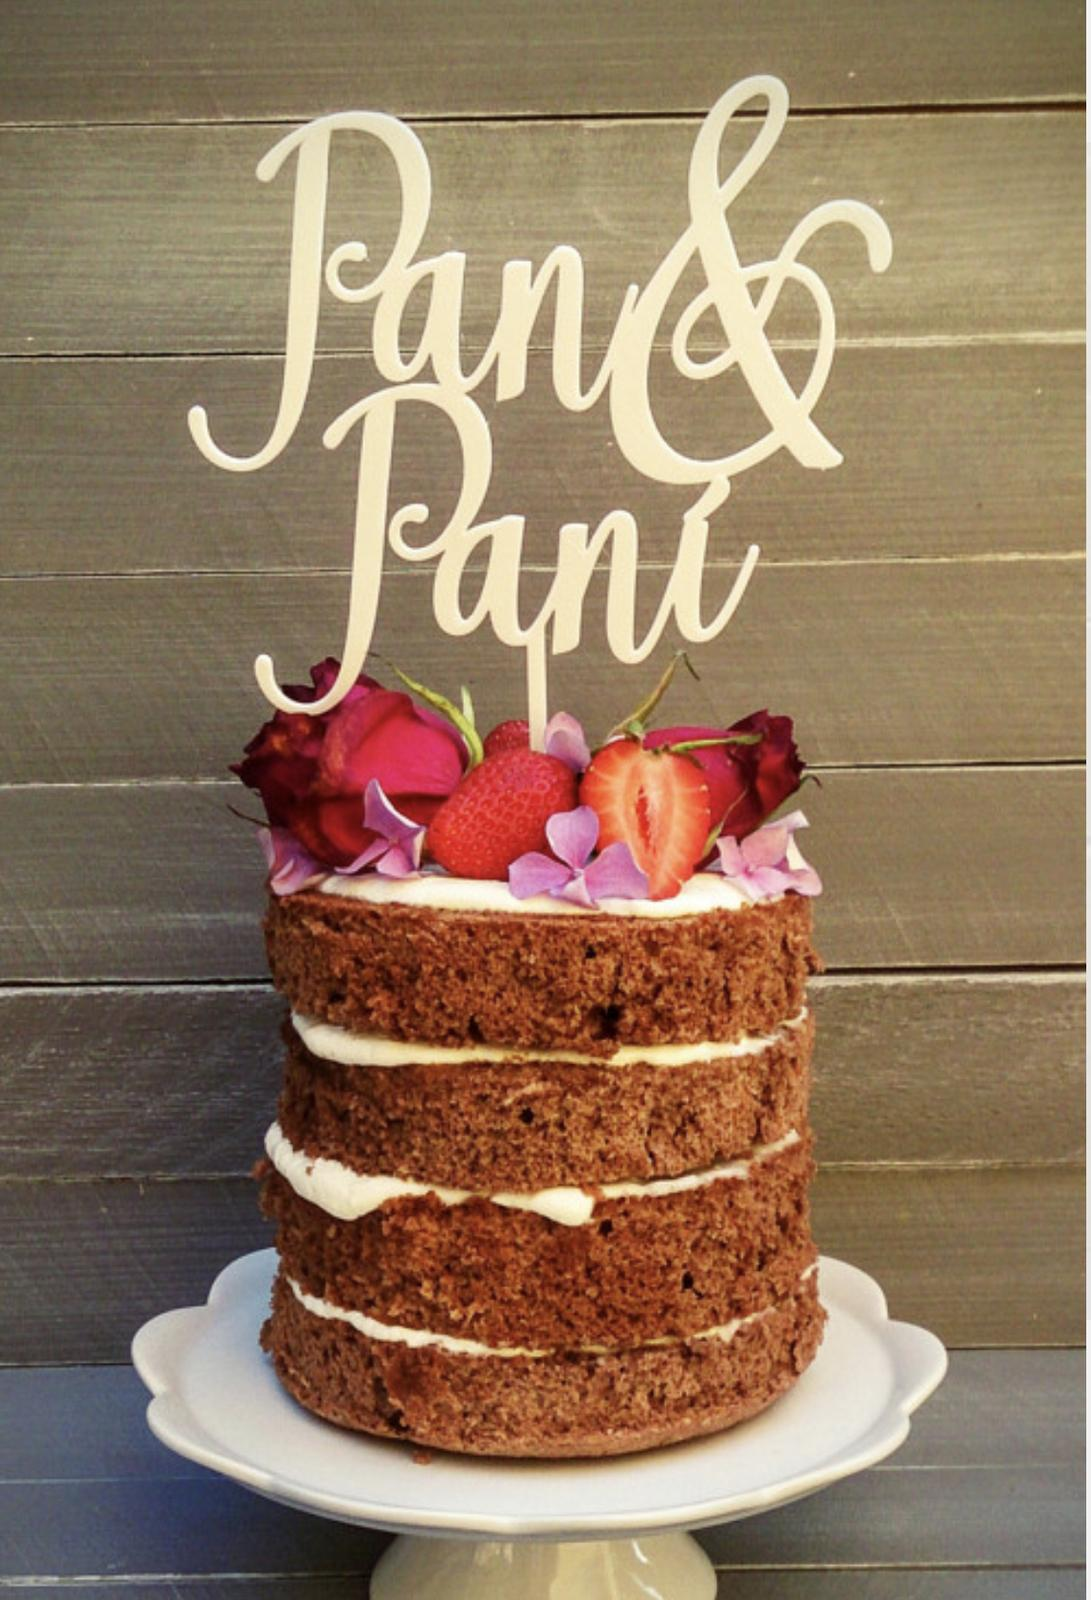 Zápich na dort a nápis na stůl - 10% SLEVA na celý nákup! - Obrázek č. 47